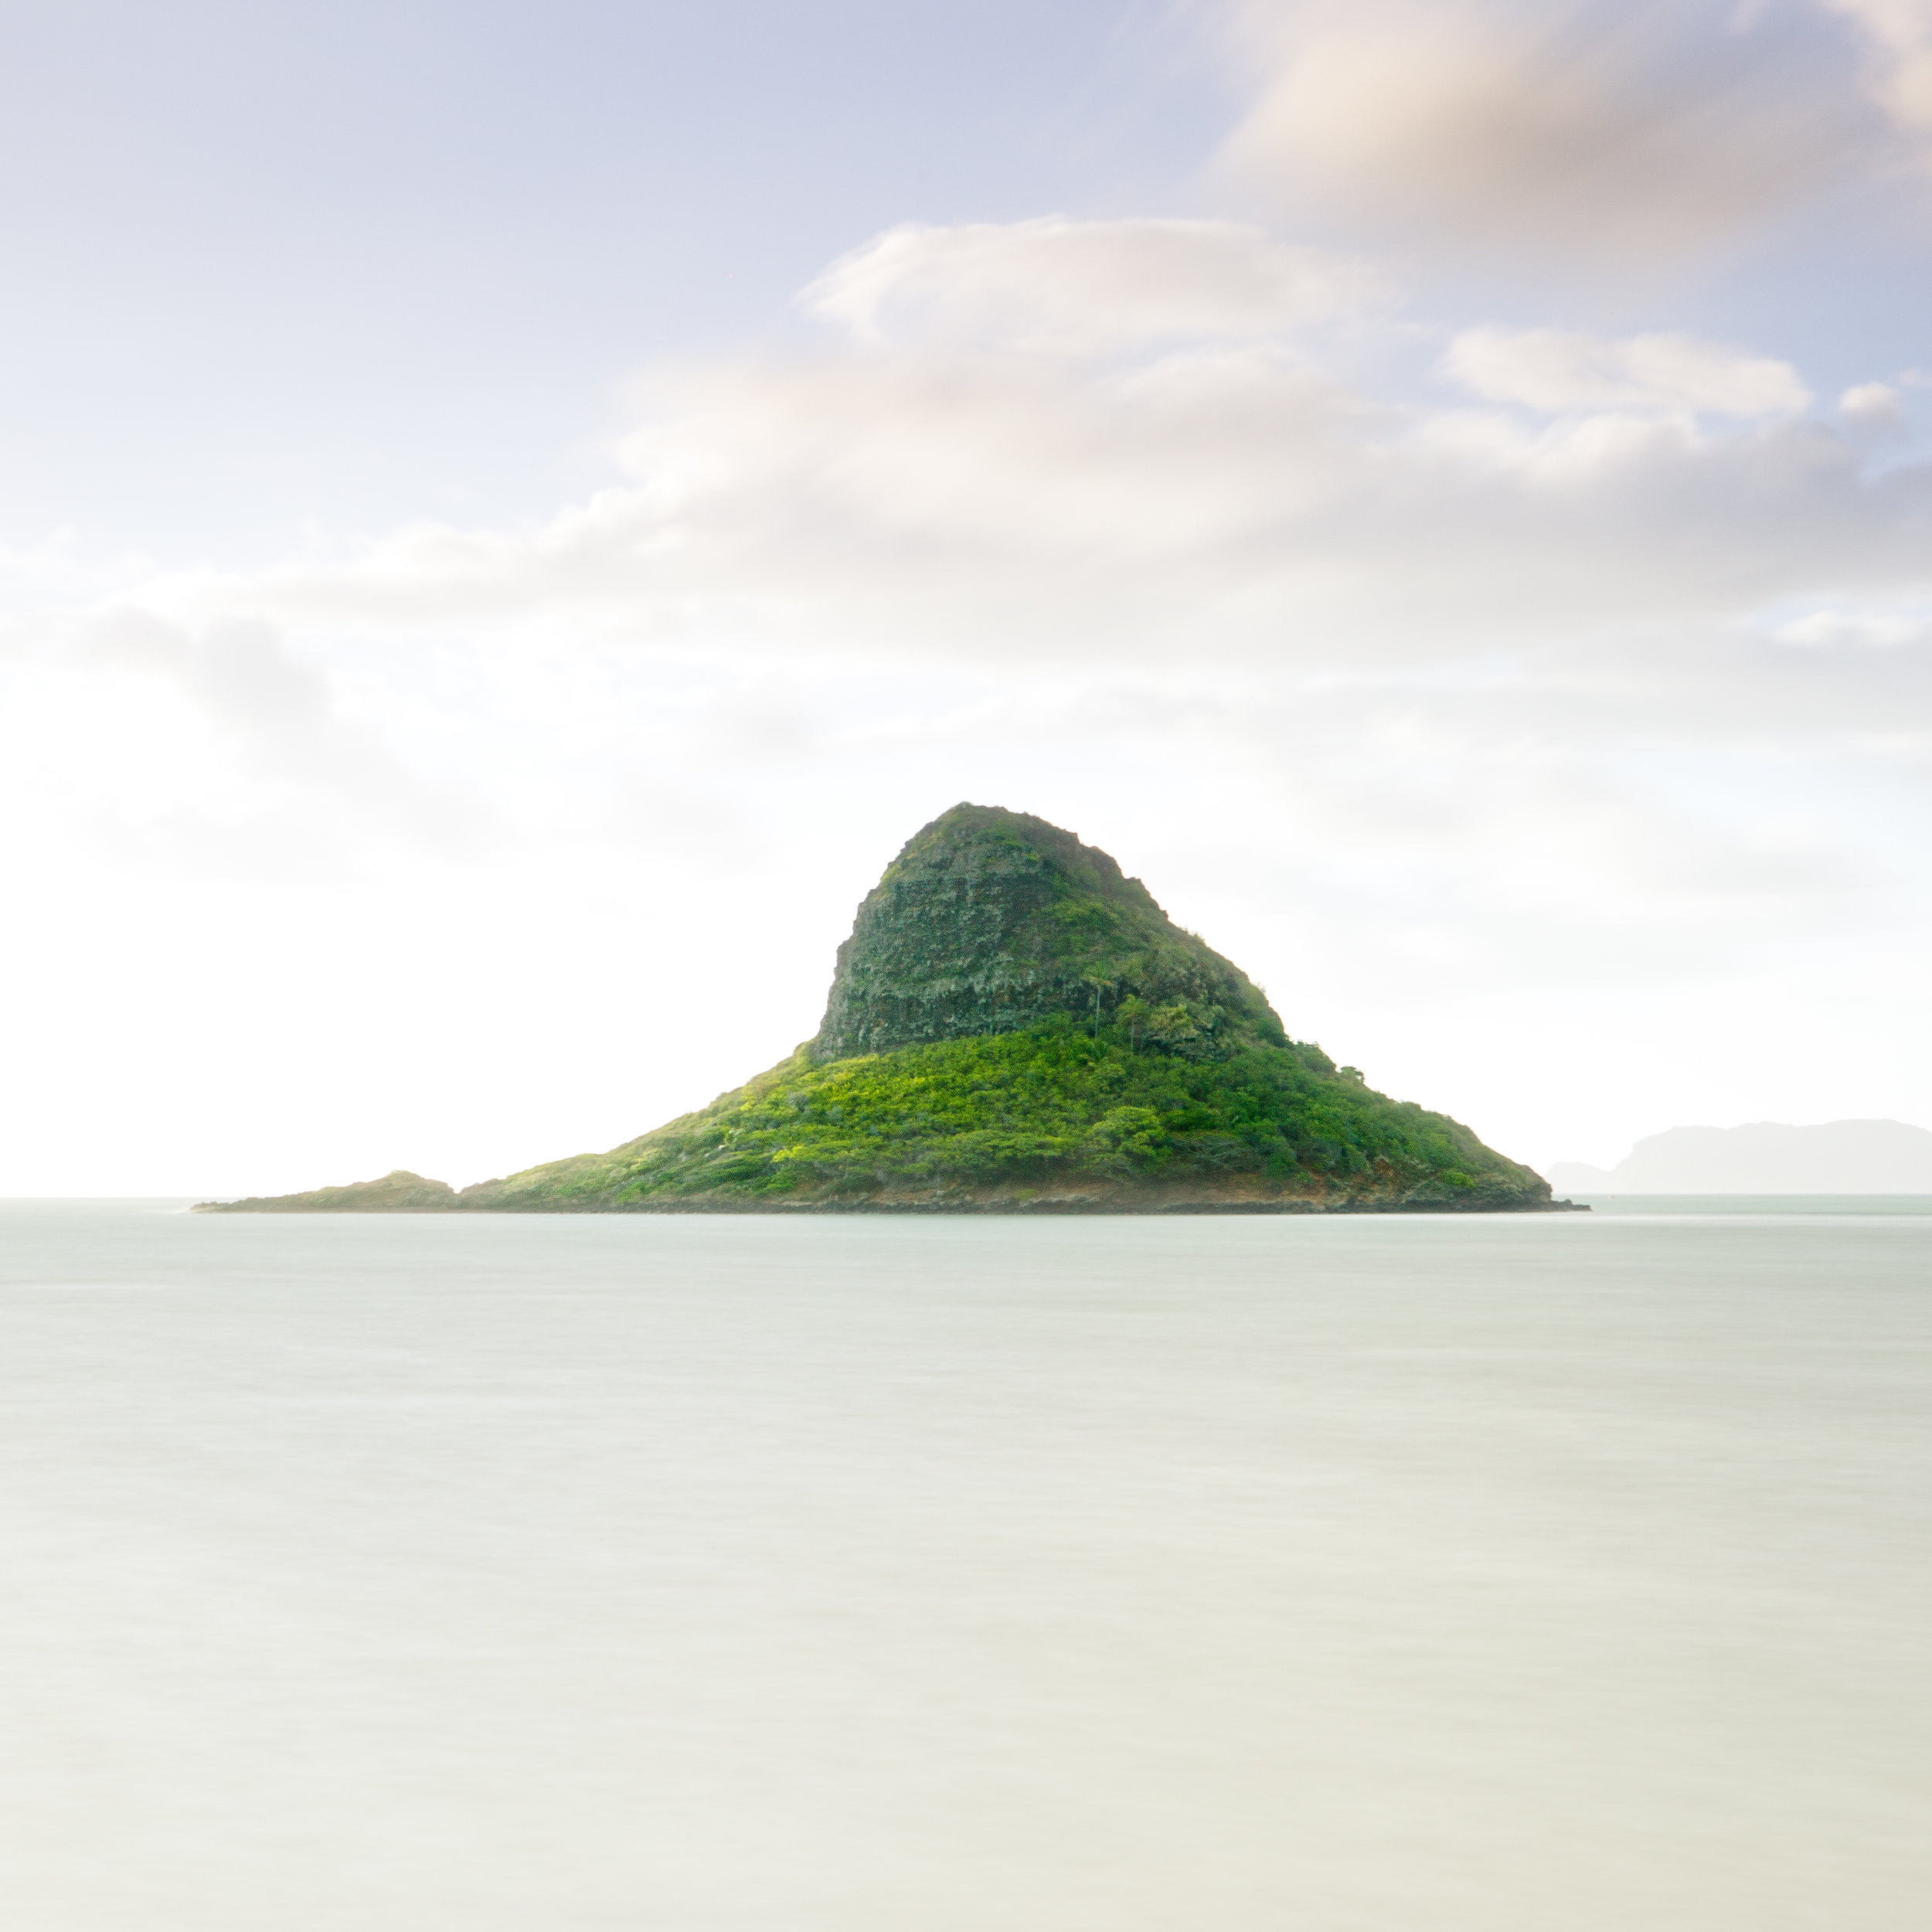 Oahu Kualoa chinaman hat island